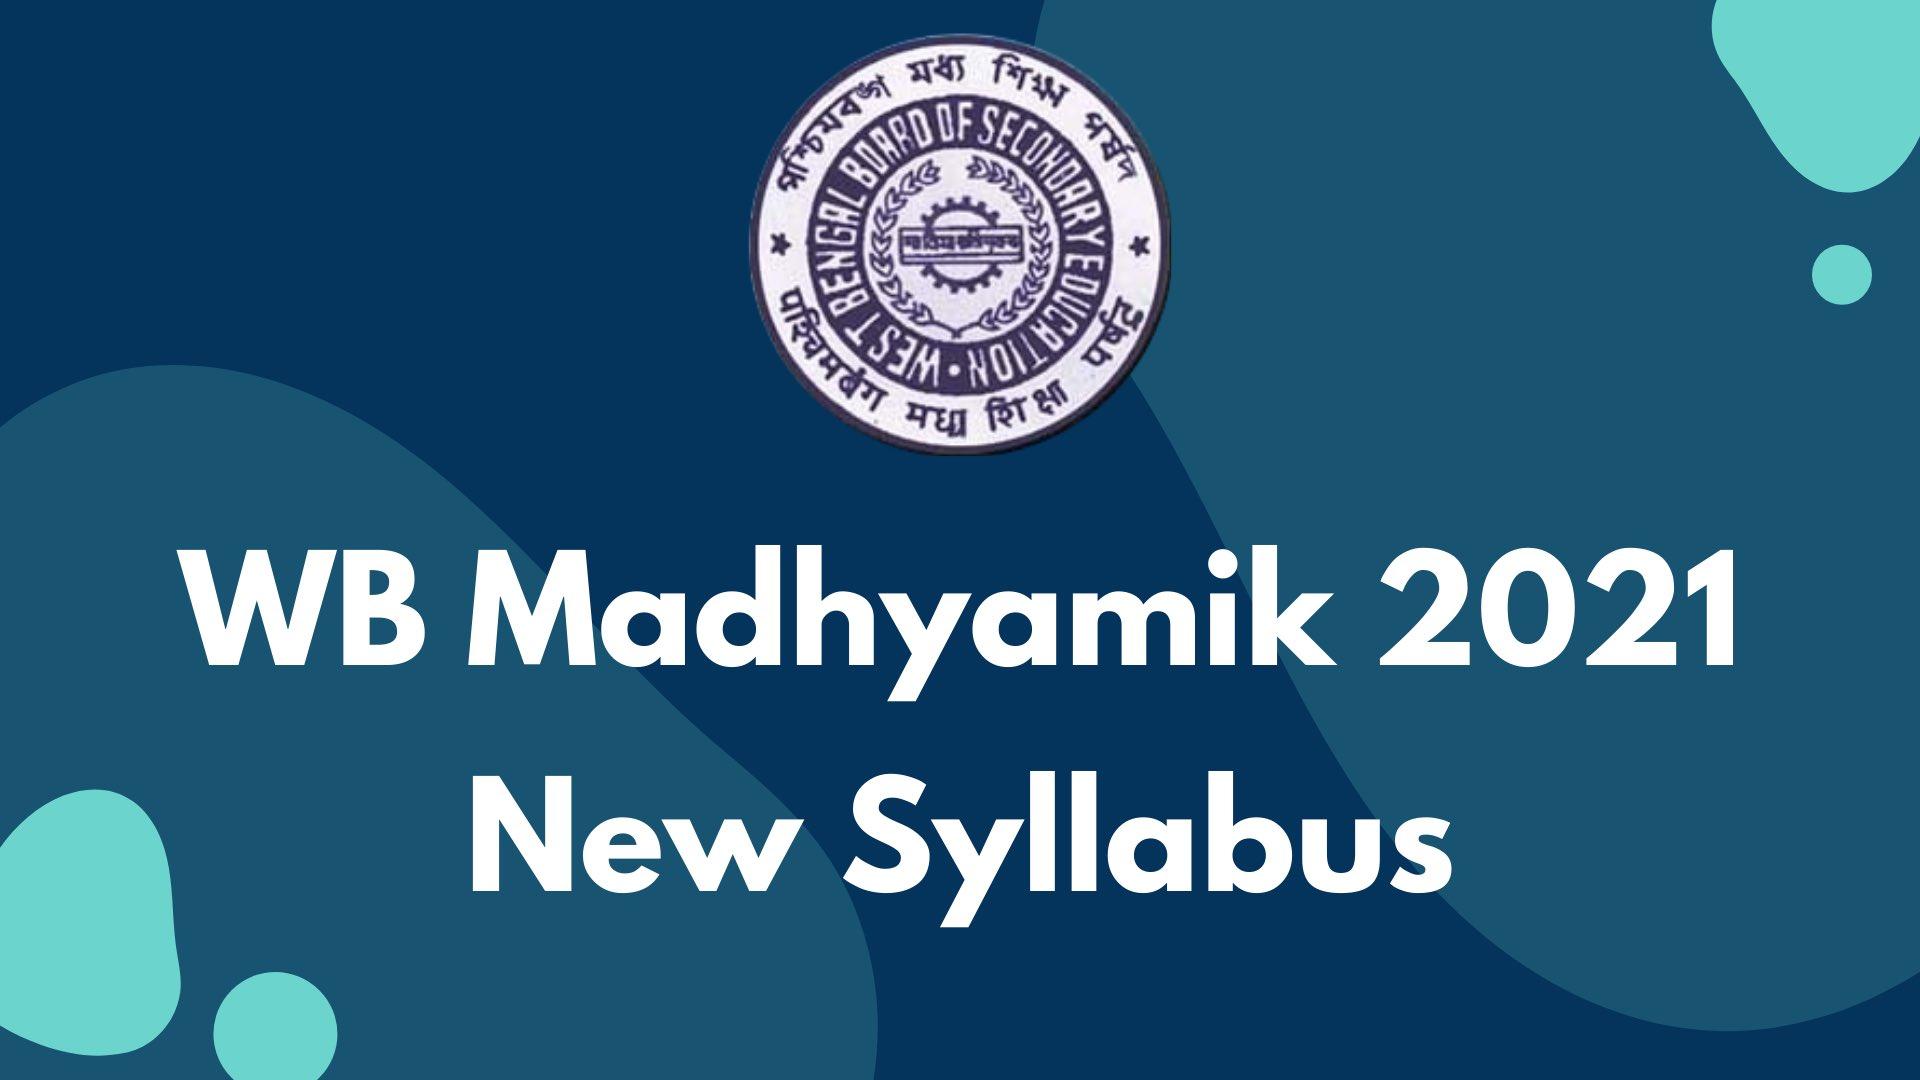 WBBSE Madhyamik 2021 New Syllabus Download